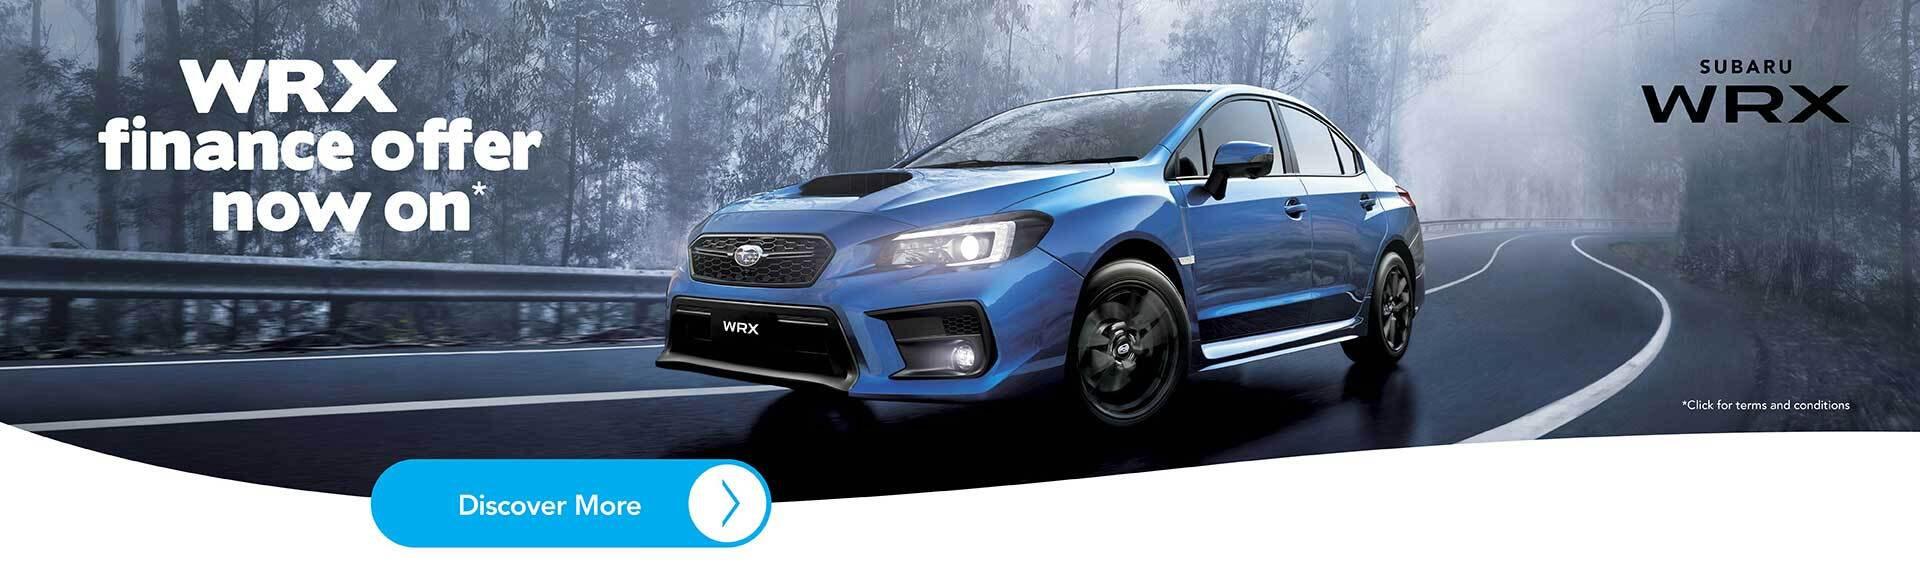 Subaru WRX Finance Offer